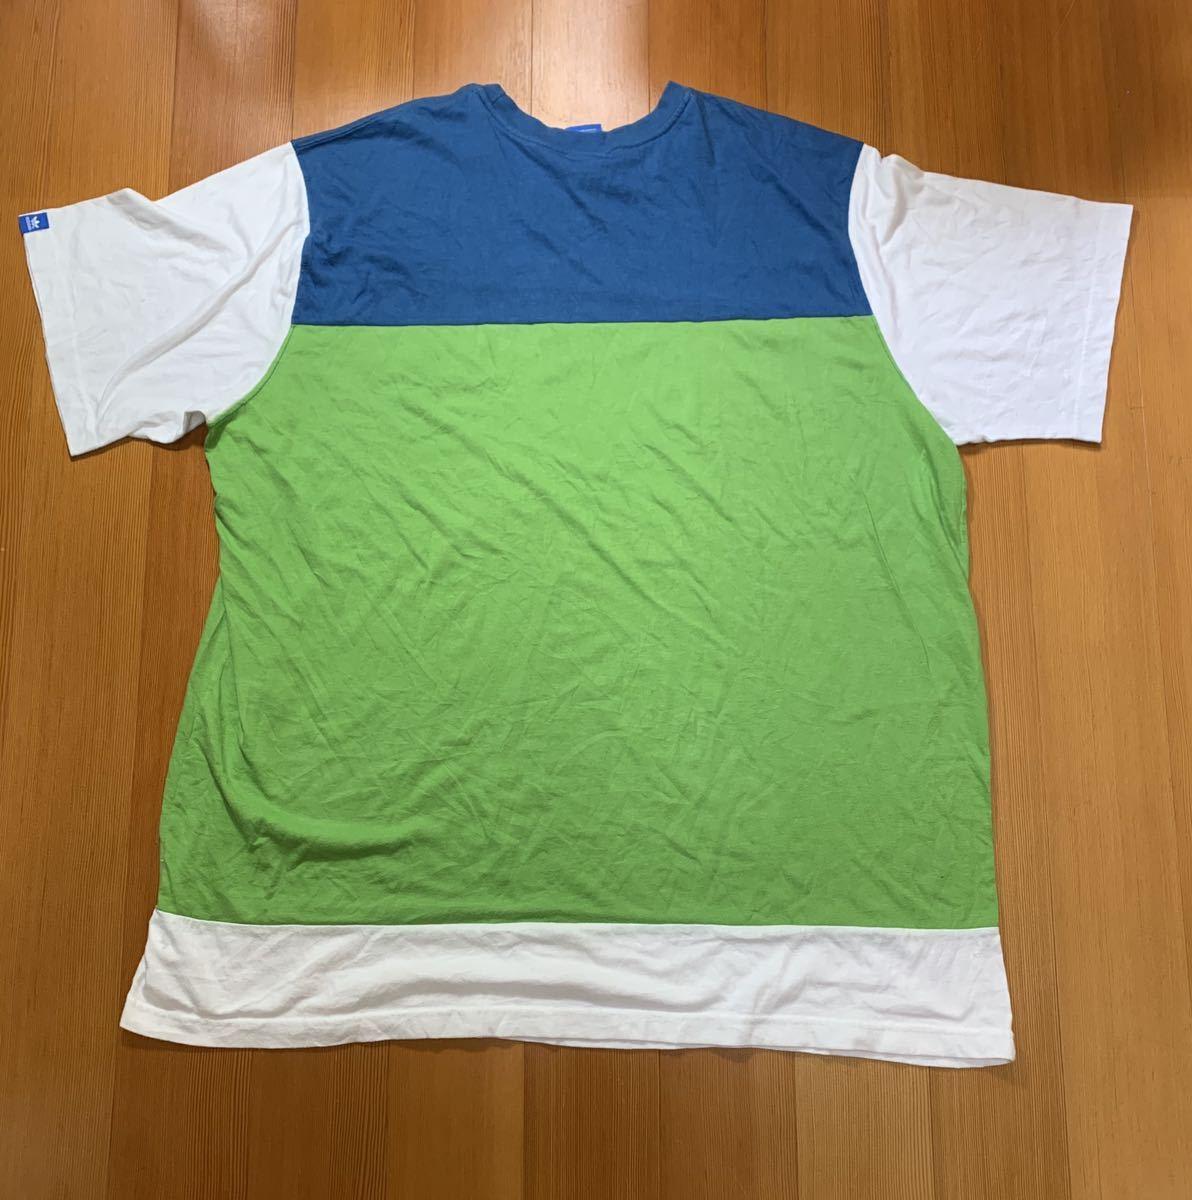 adidas アディダス Tシャツ メンズ レディース オーバーサイズ 大きめ 半袖Tシャツ オーバーサイズ